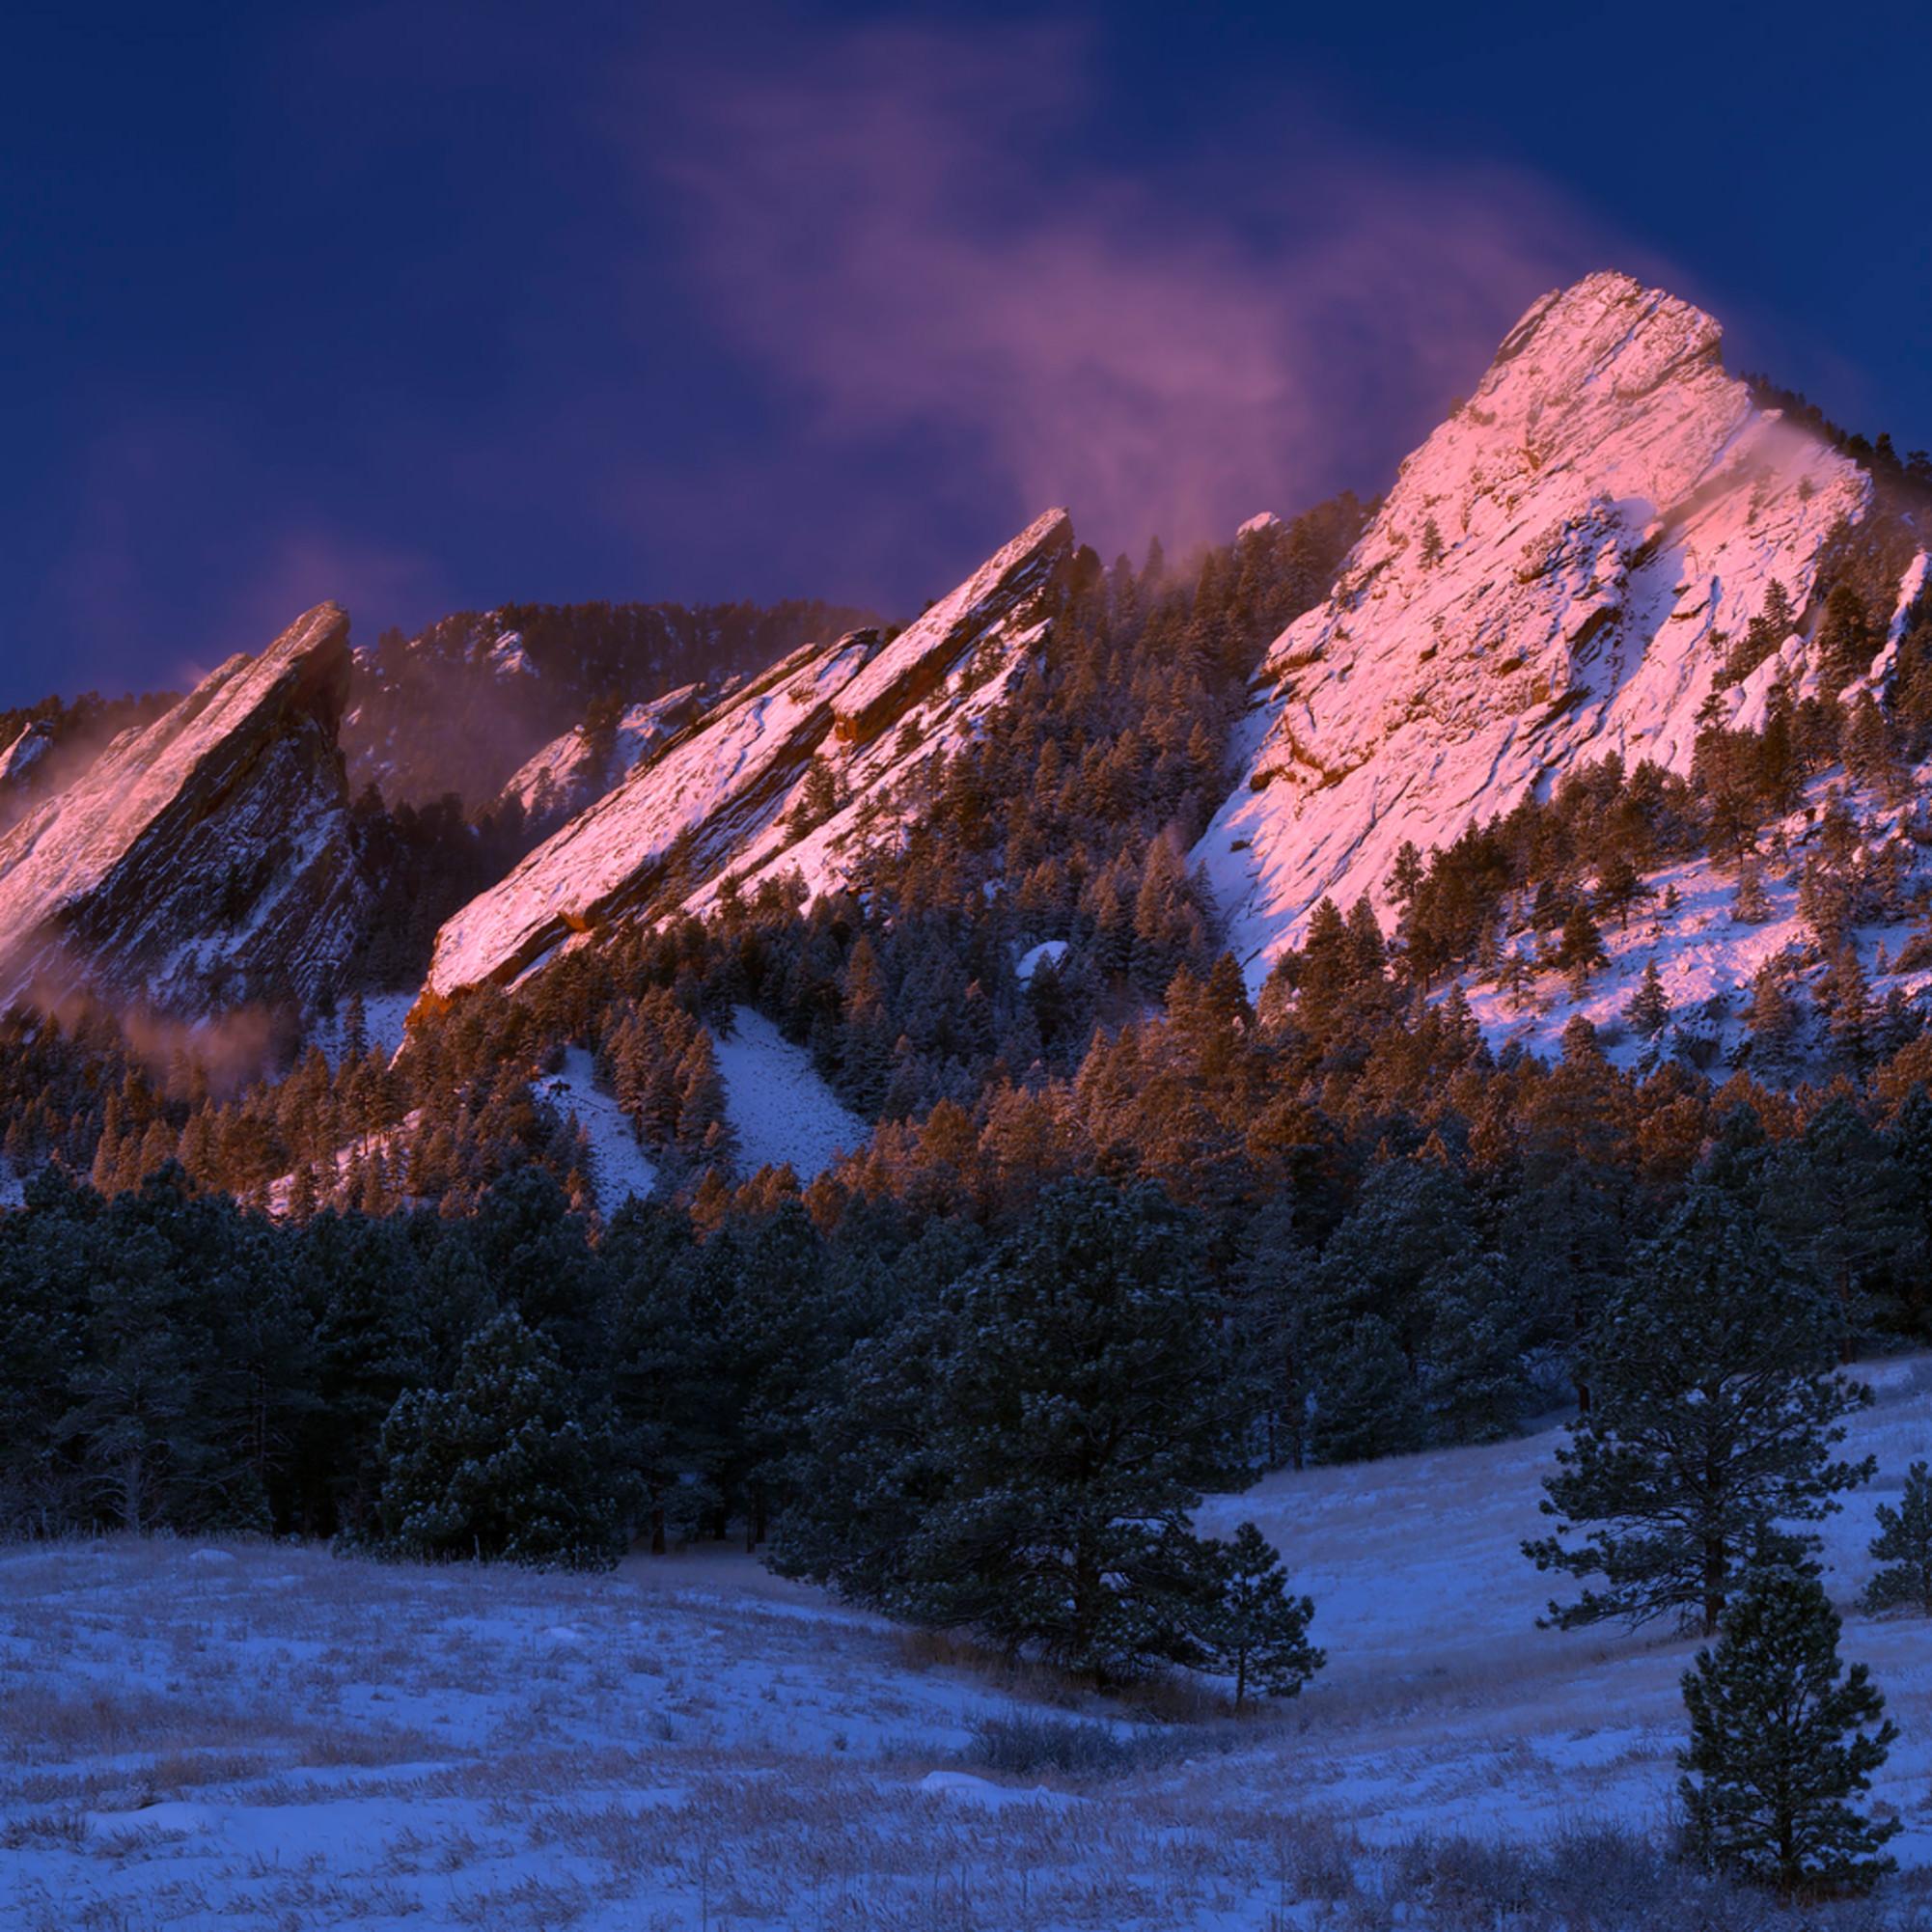 Winter sunrise on the flatirons 2 y9hjxs